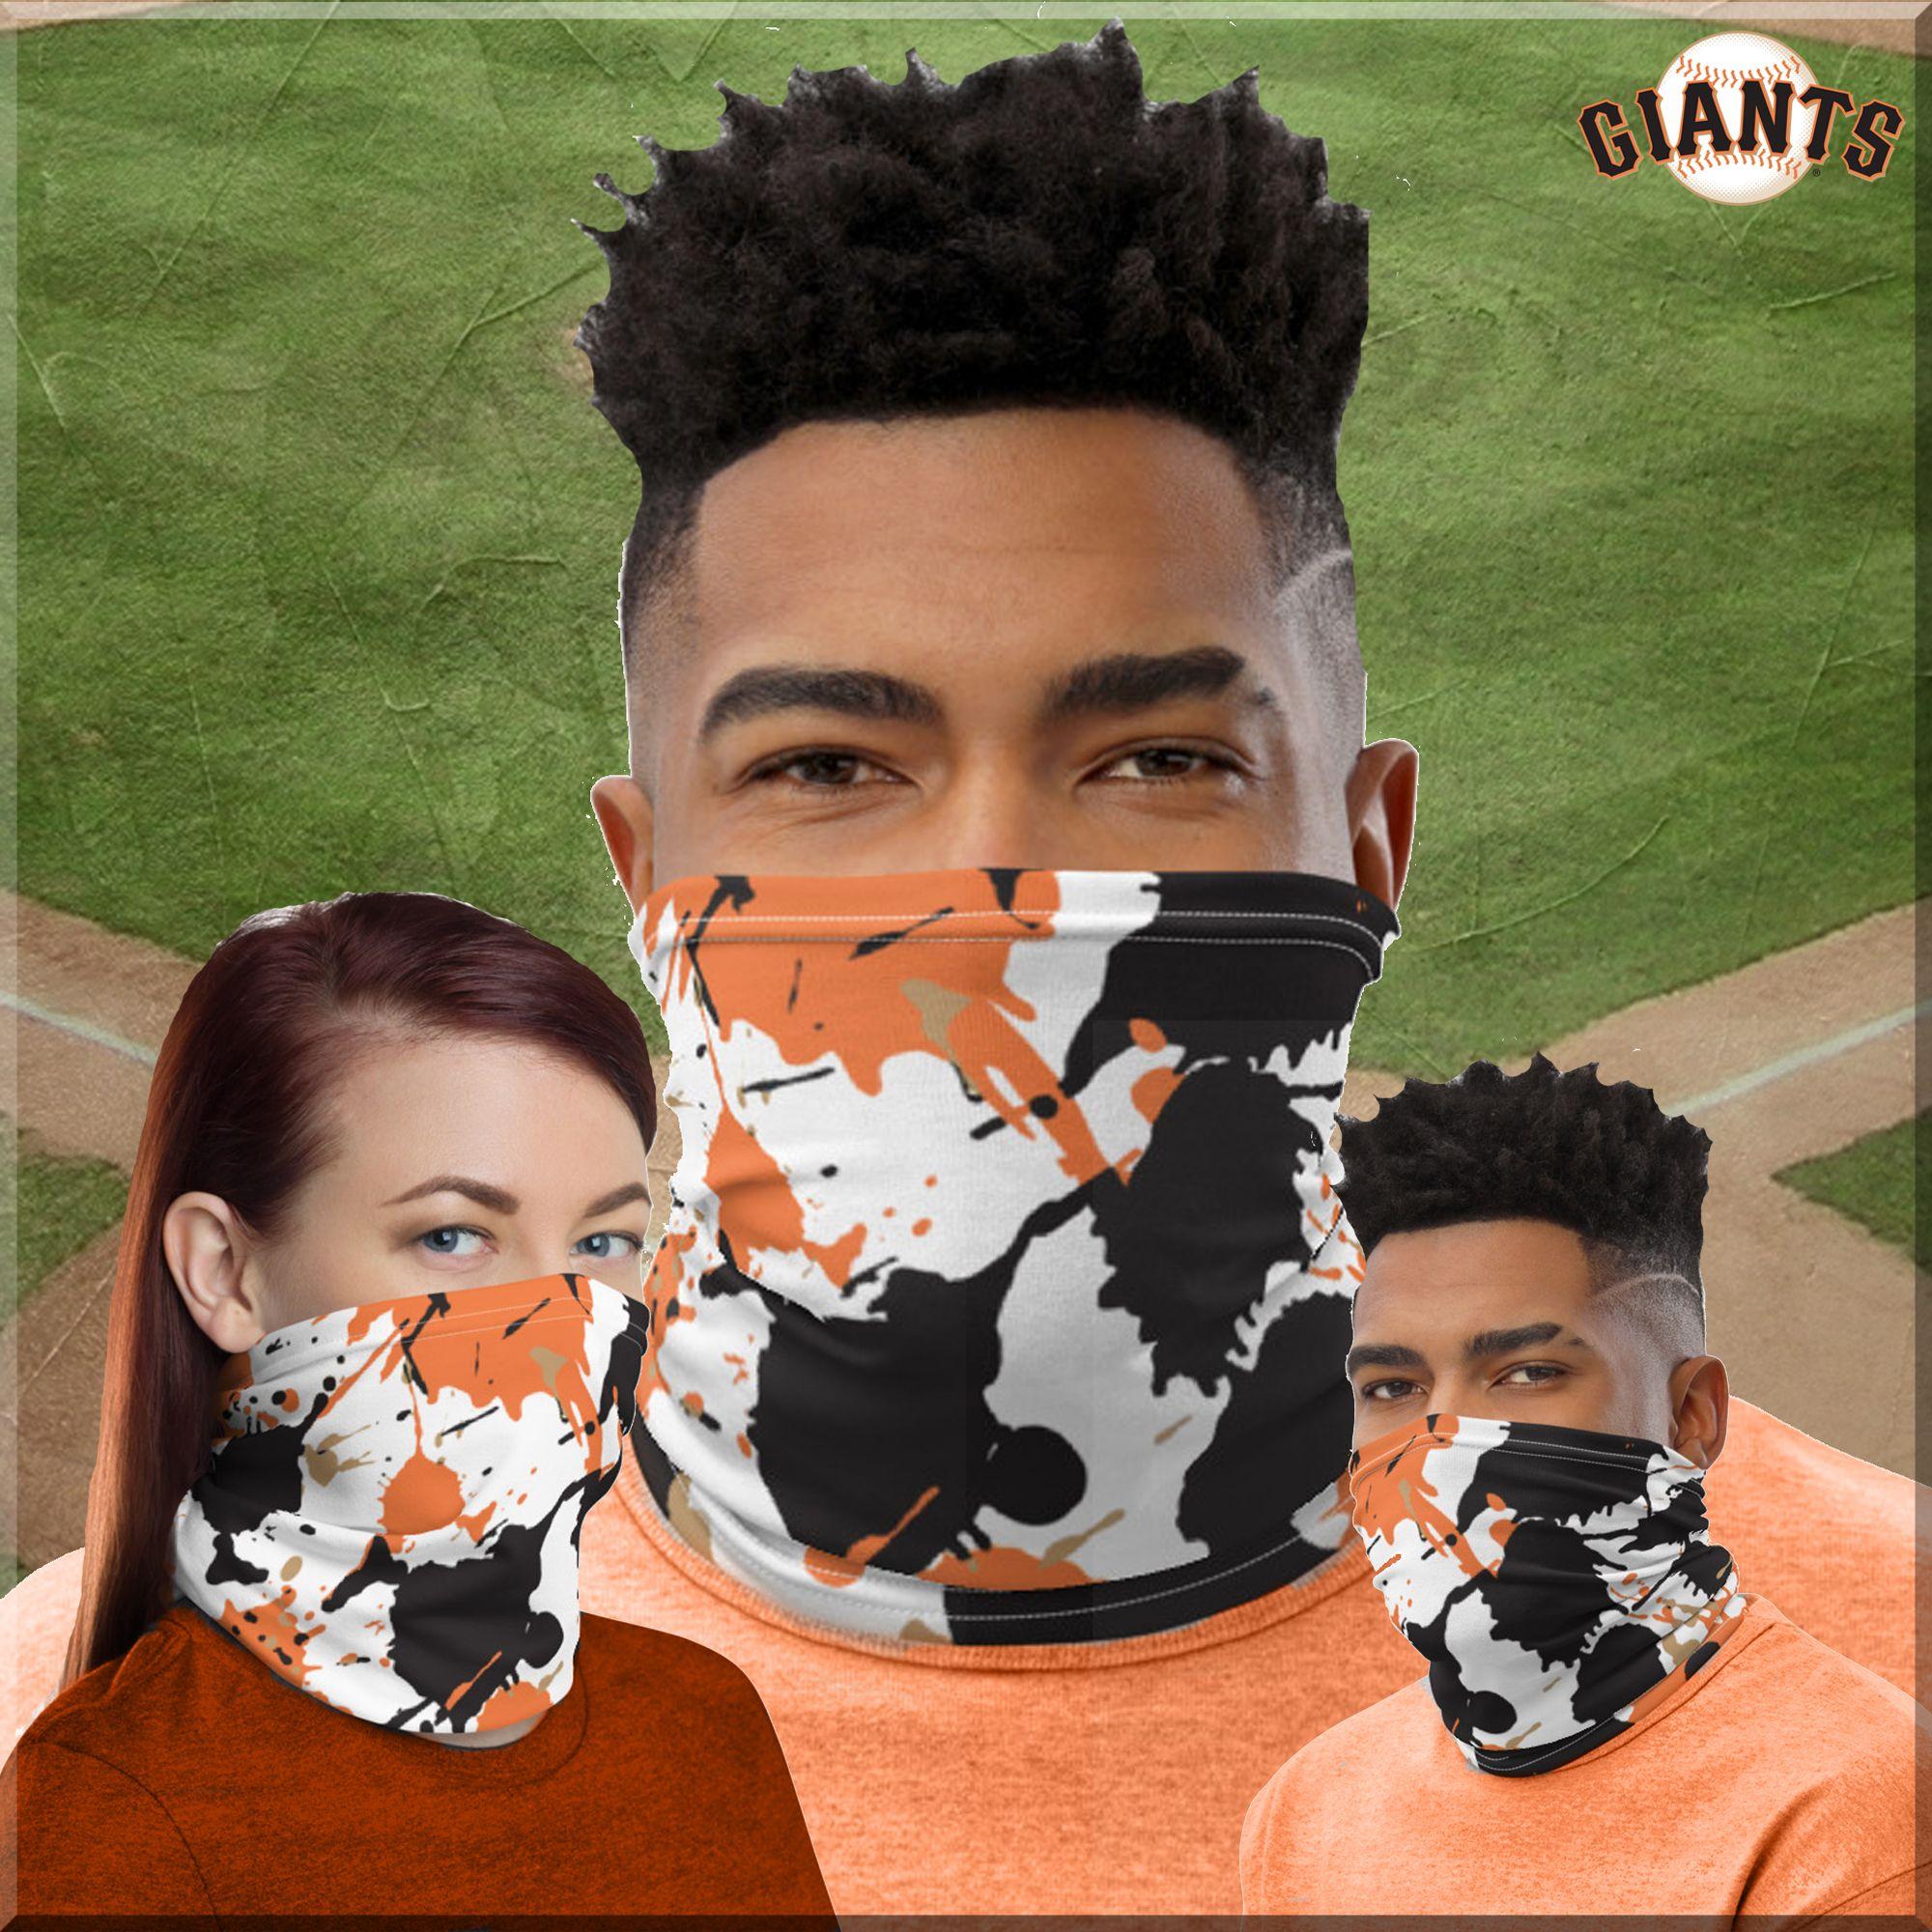 Nl West Mlb Baseball Diamondbacks Dodgers Giants Padres Rockies Inspired Neck Gaiter Face Cover Bandana Headband Face Mask Urban Street Wear In 2020 Baseball Inspired Neck Gaiter Street Wear Urban